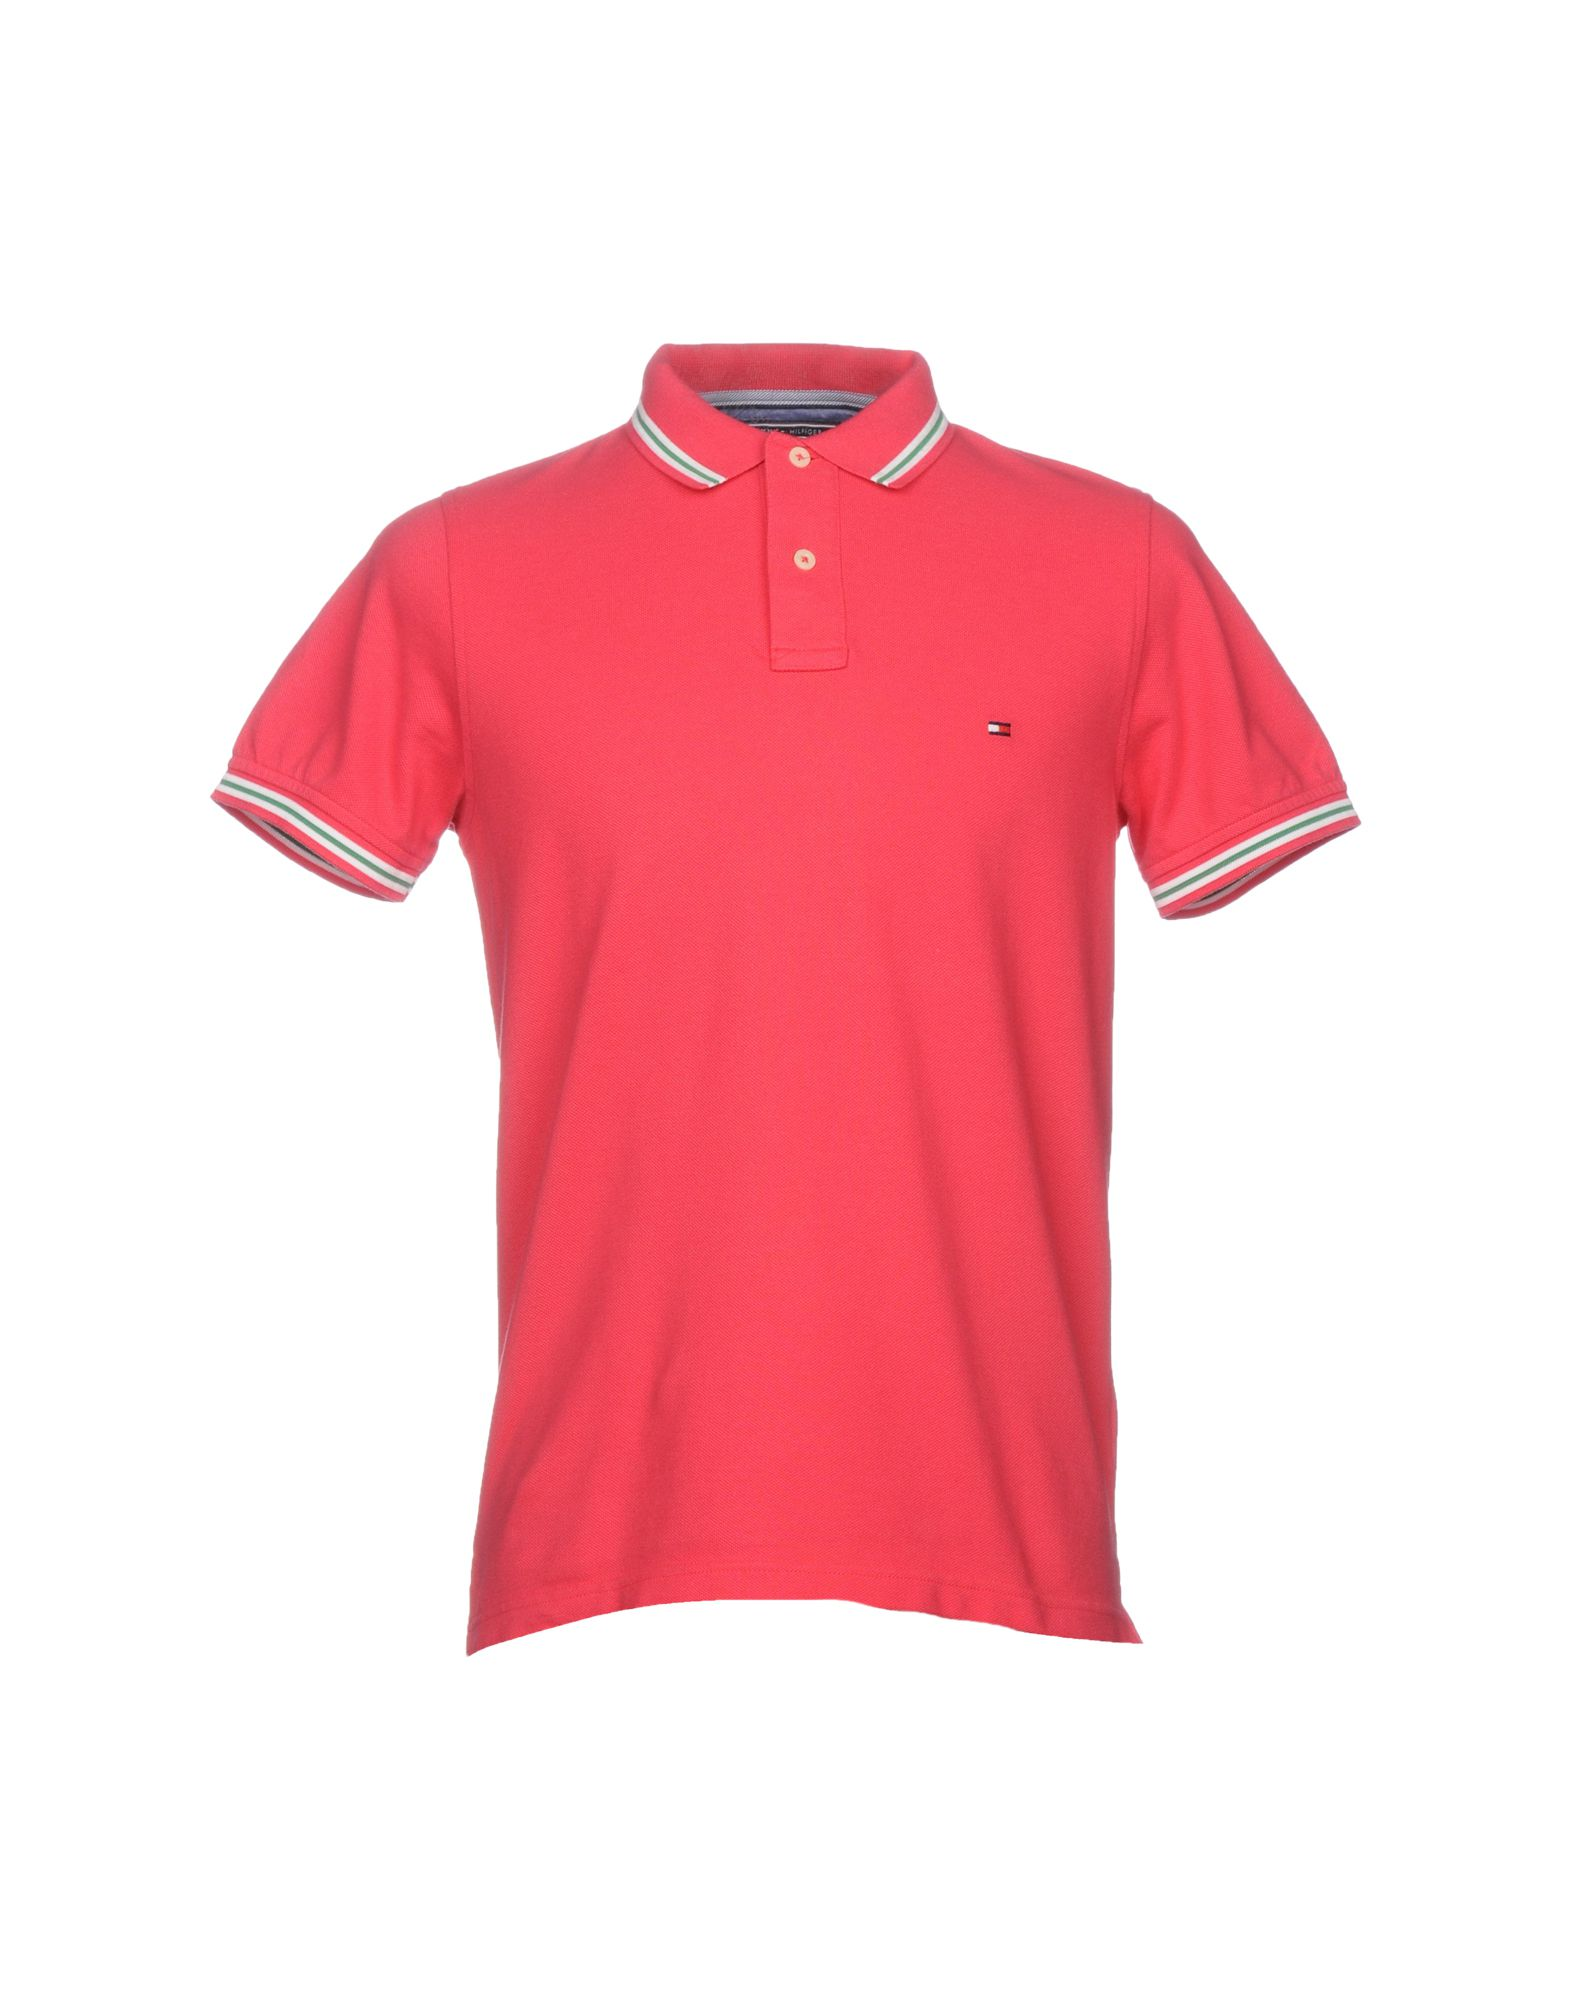 TOMMY HILFIGER Поло футболка детская tommy hilfiger polo polo